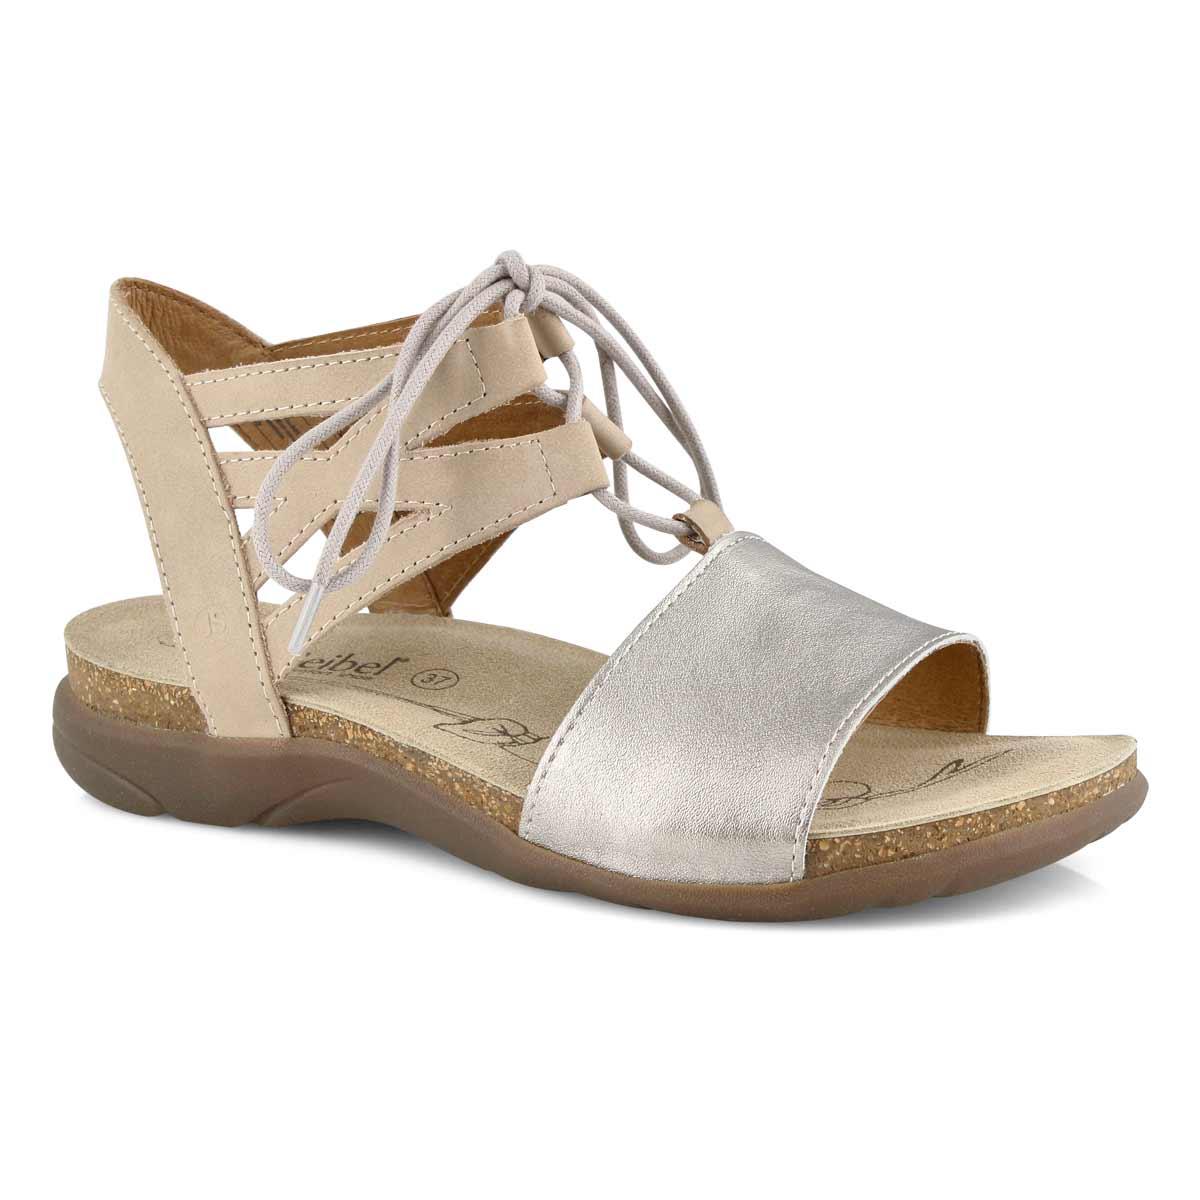 Lds Riley 06 beige lace up casual sandal